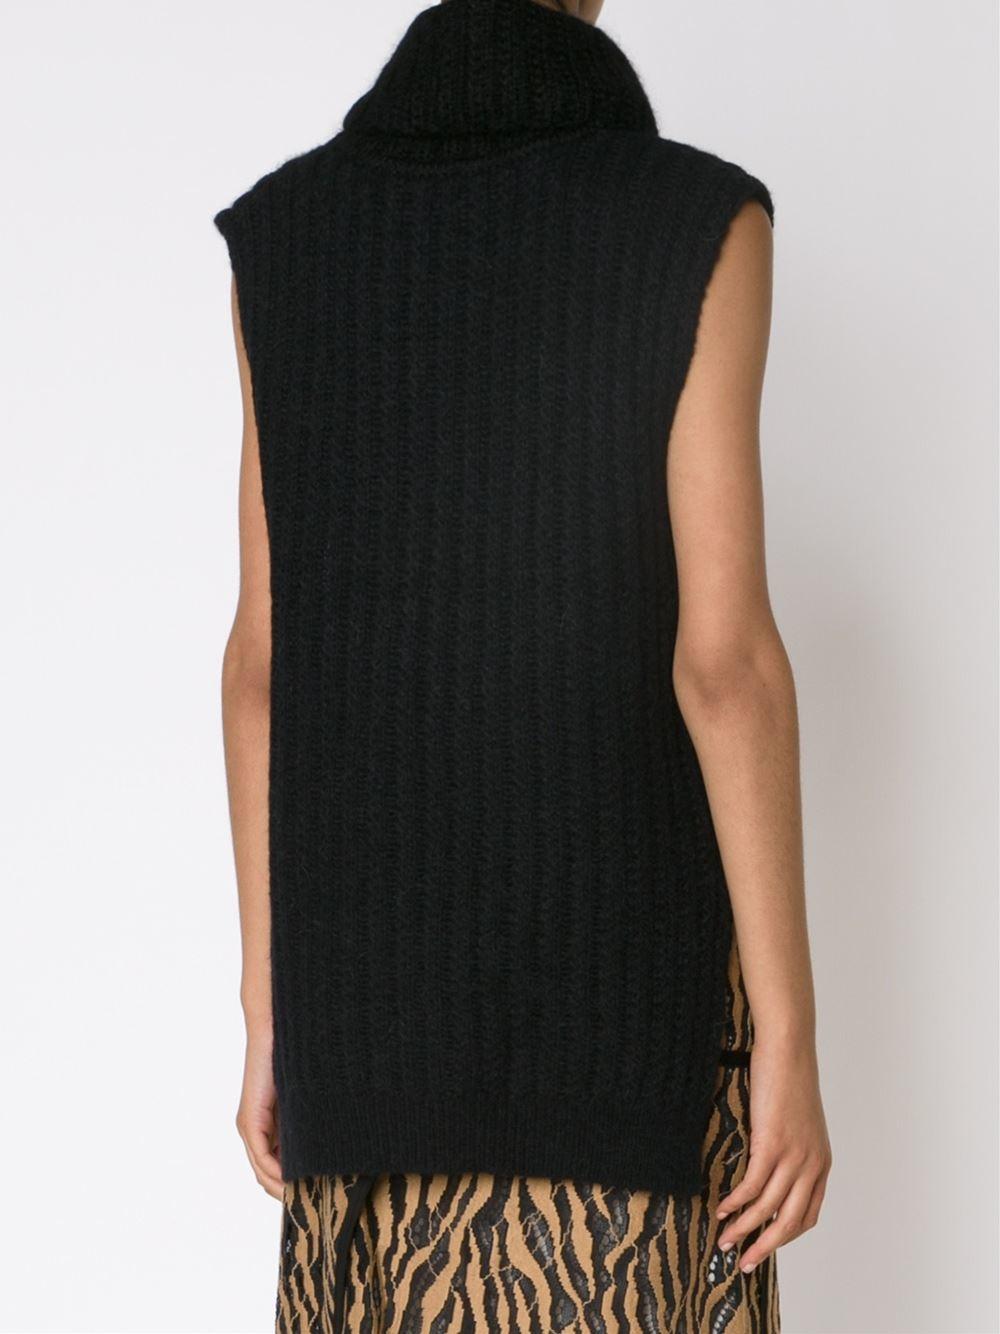 Black Sleeveless Sweater 101